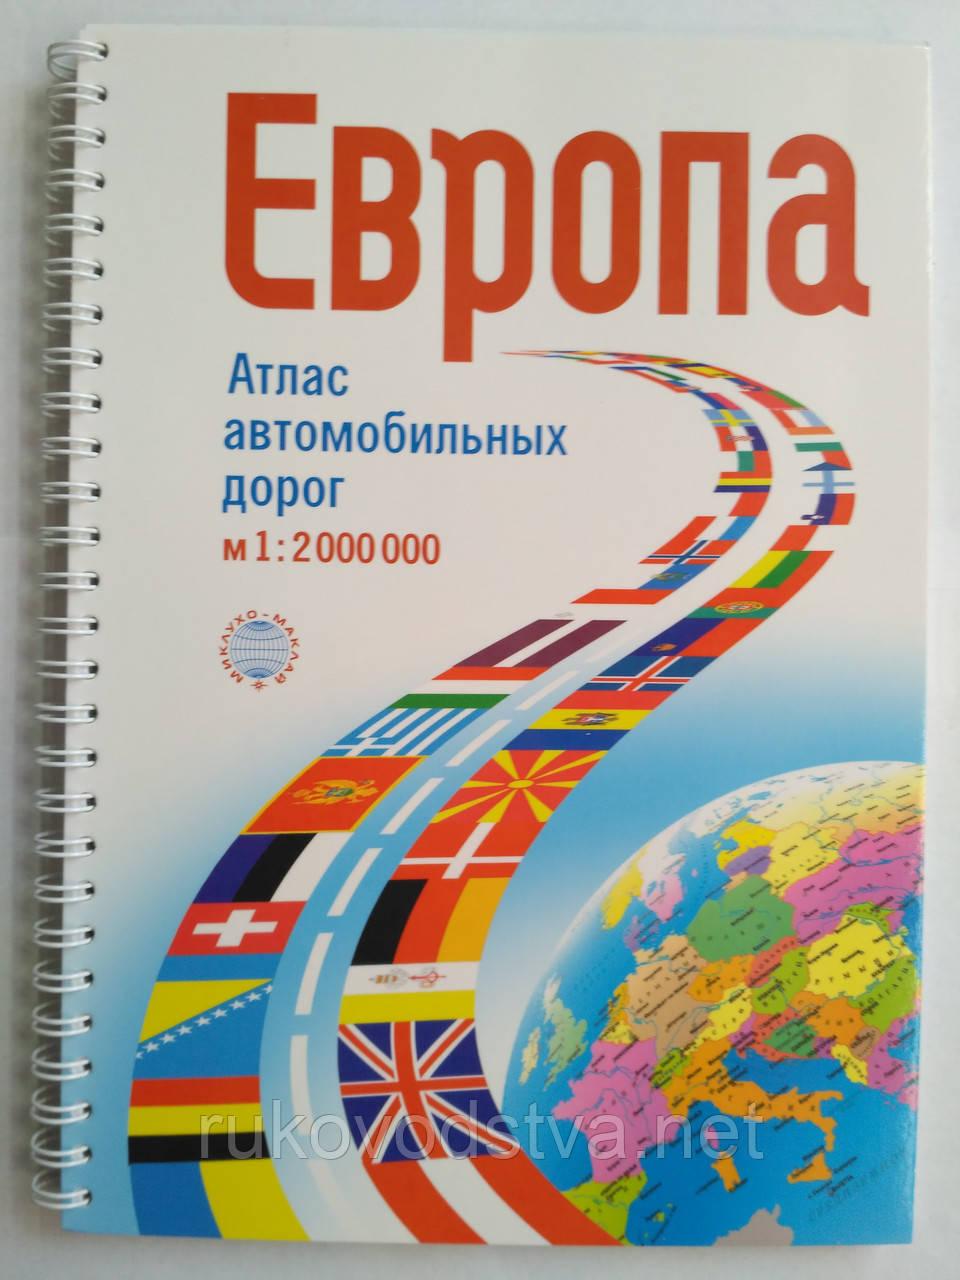 Атлас автодорог Европы 1:2000000